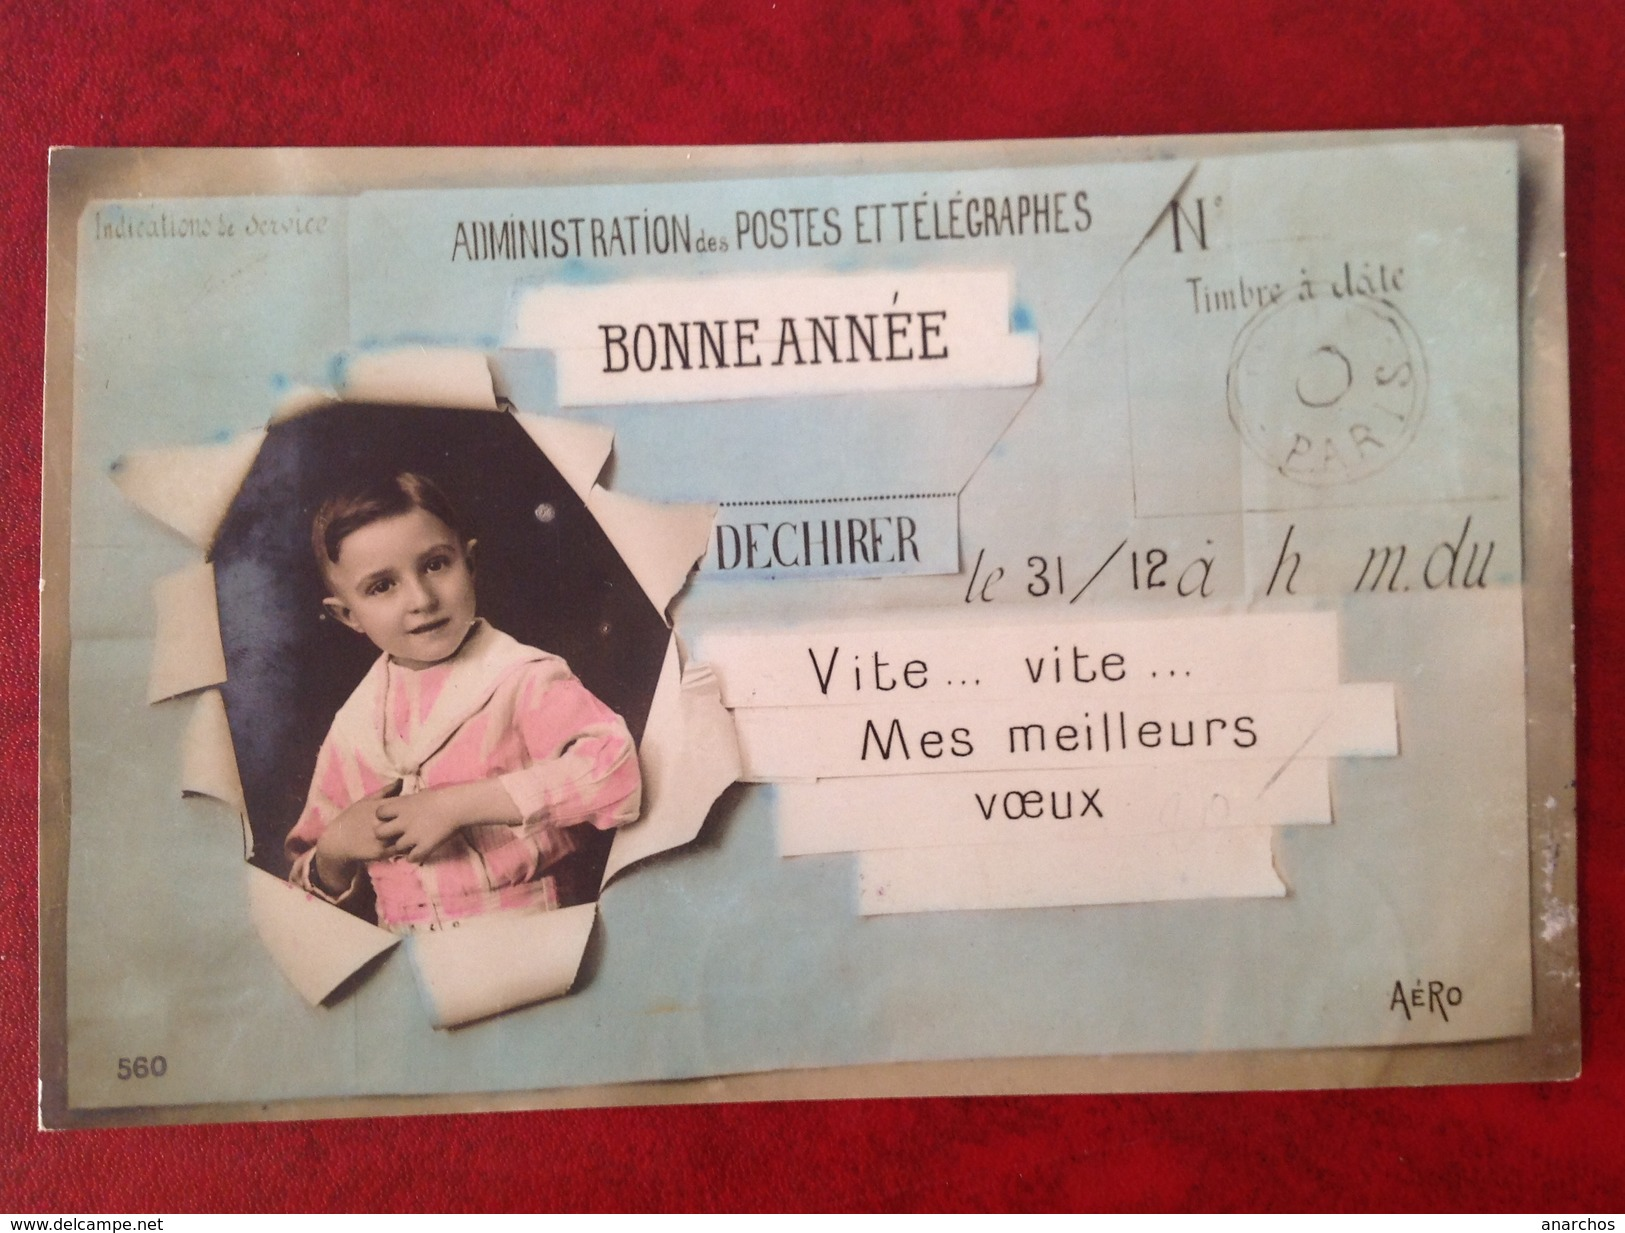 Télégramme - Postal Services